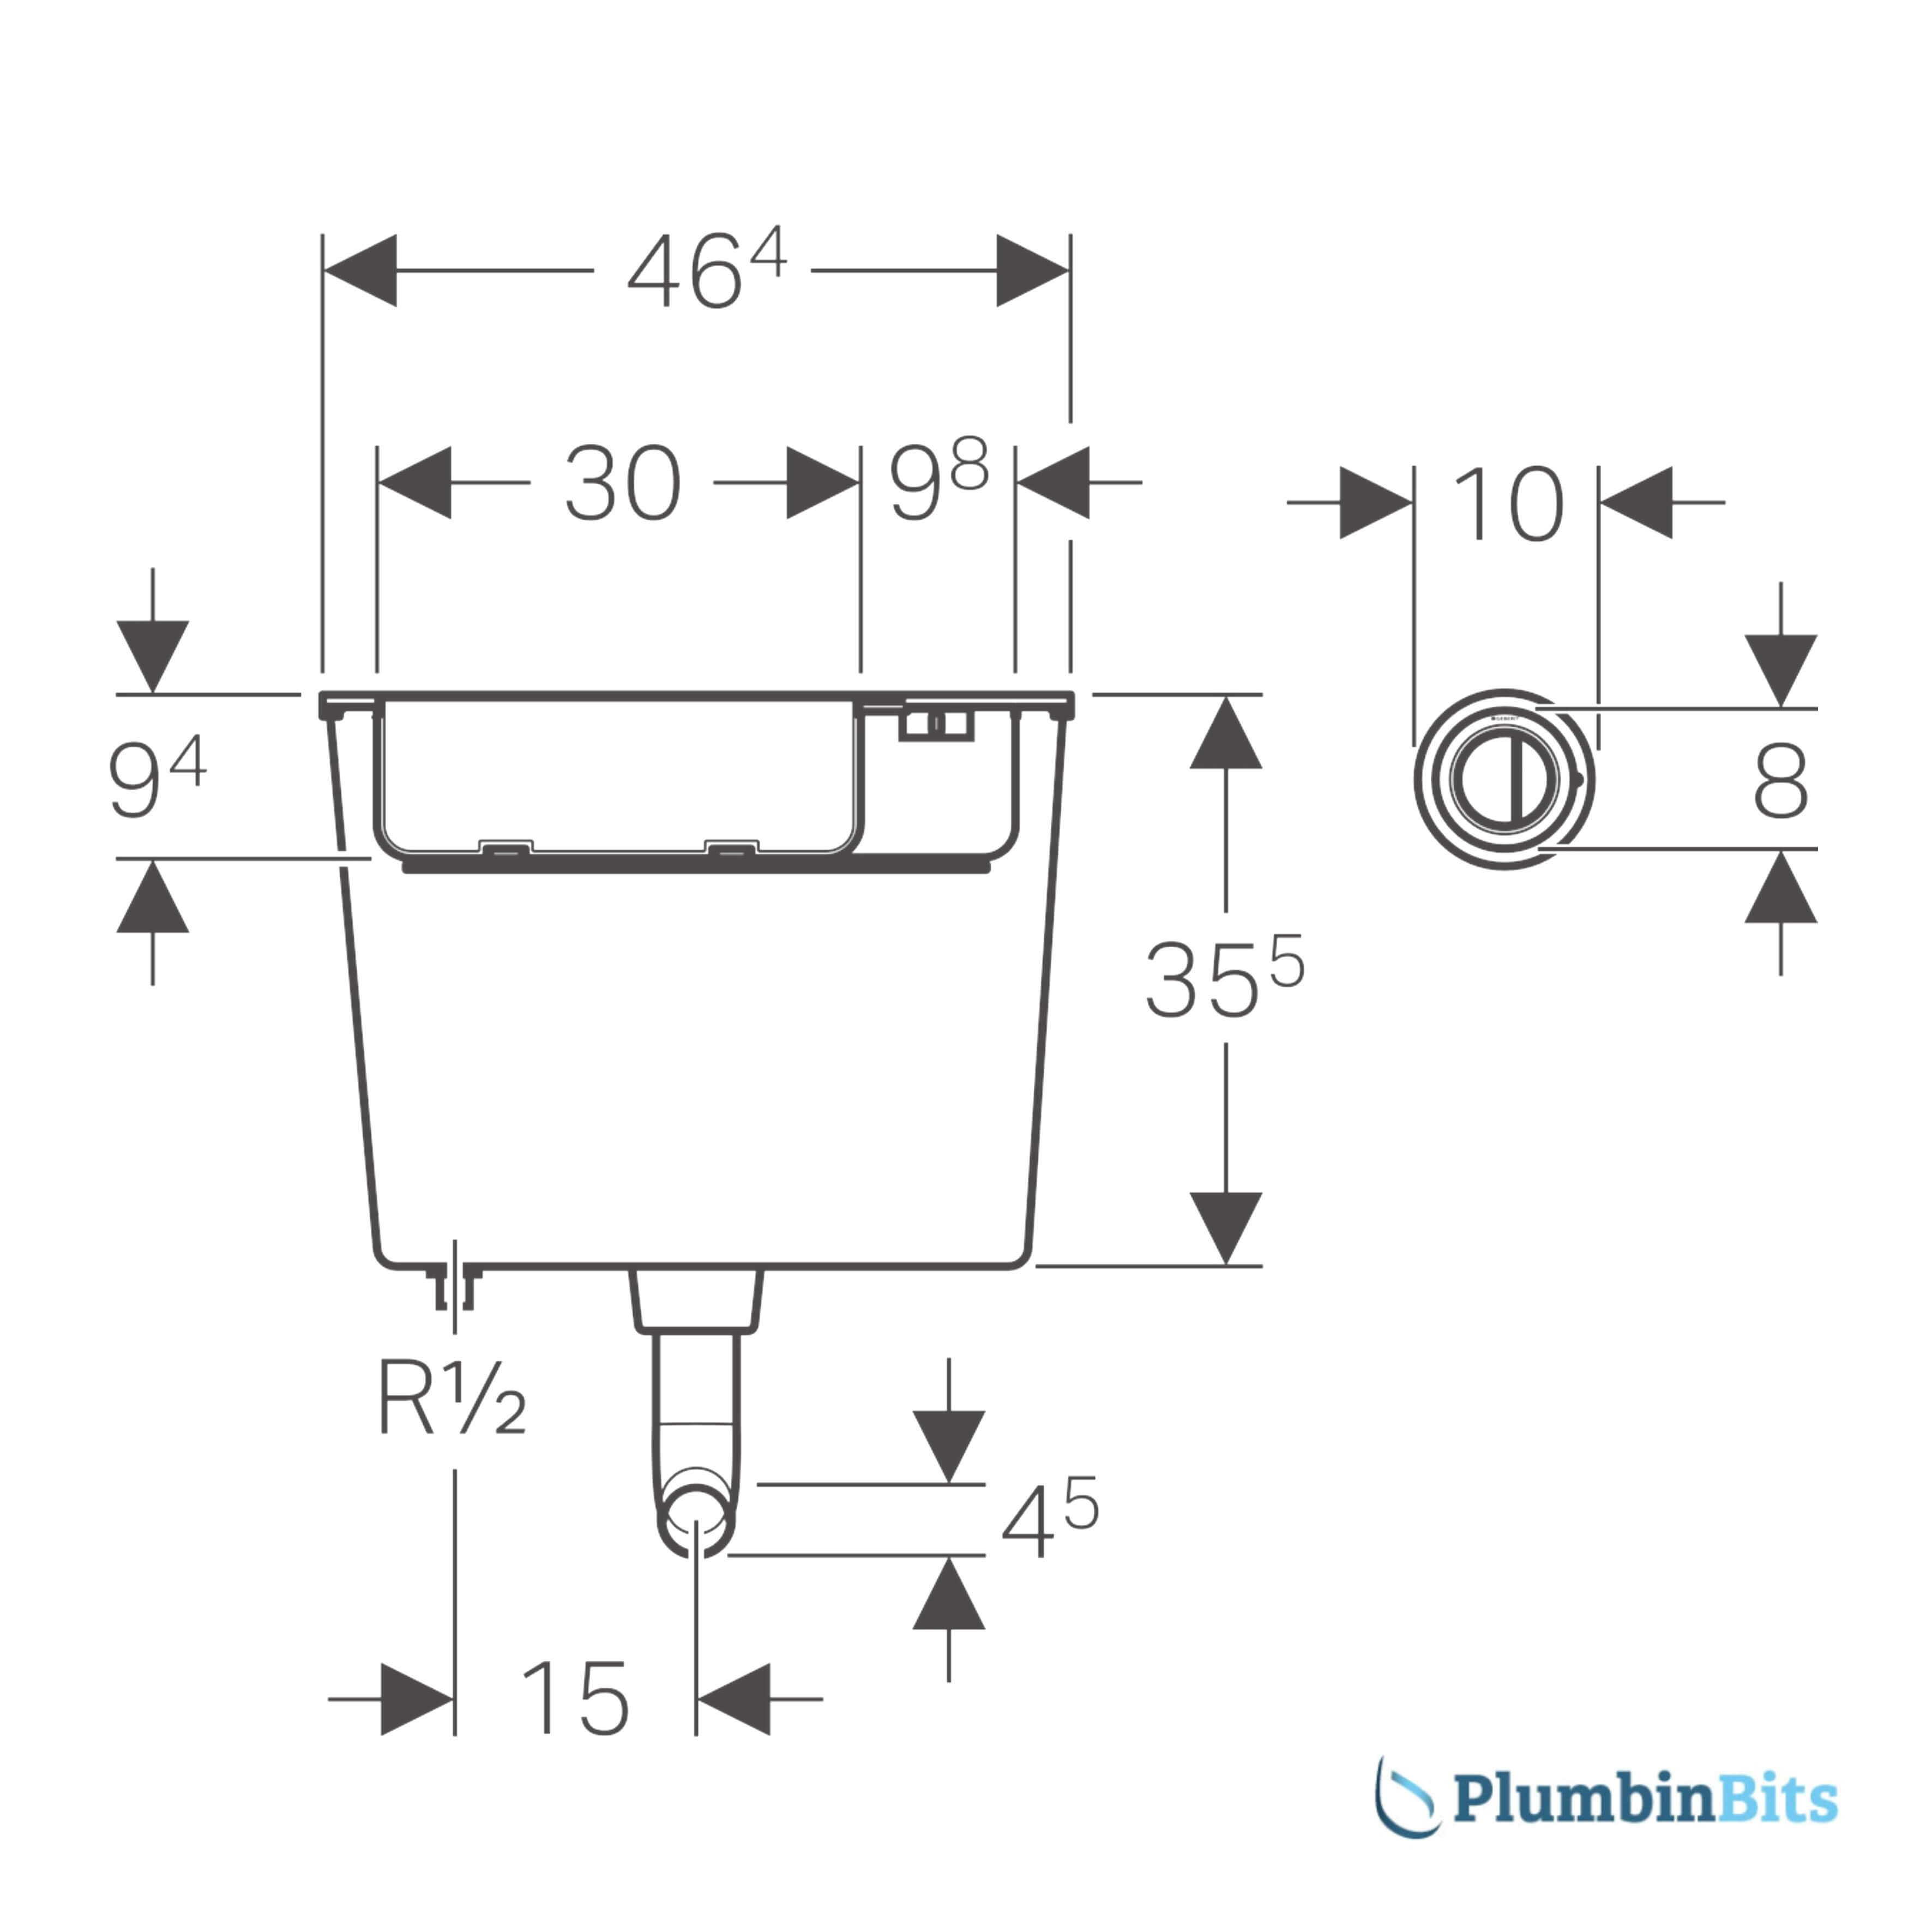 109.724.21.1 Cistern Measurement